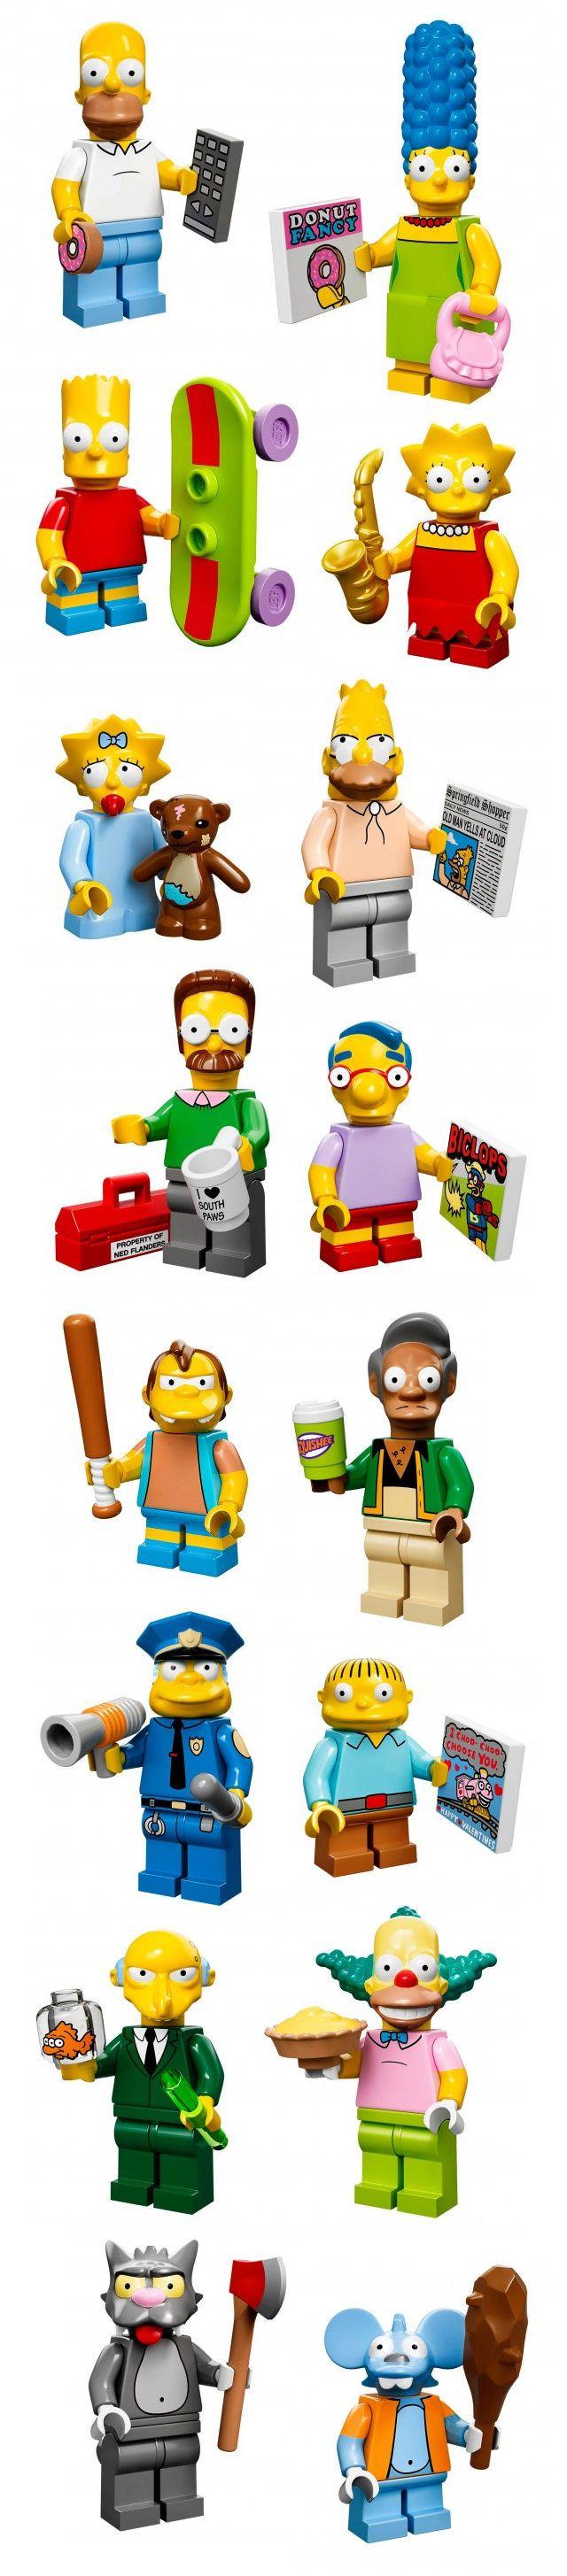 I Choo-Choo-Choose You: LEGO Unveils A Whole Set Of Simpsons Minifigs